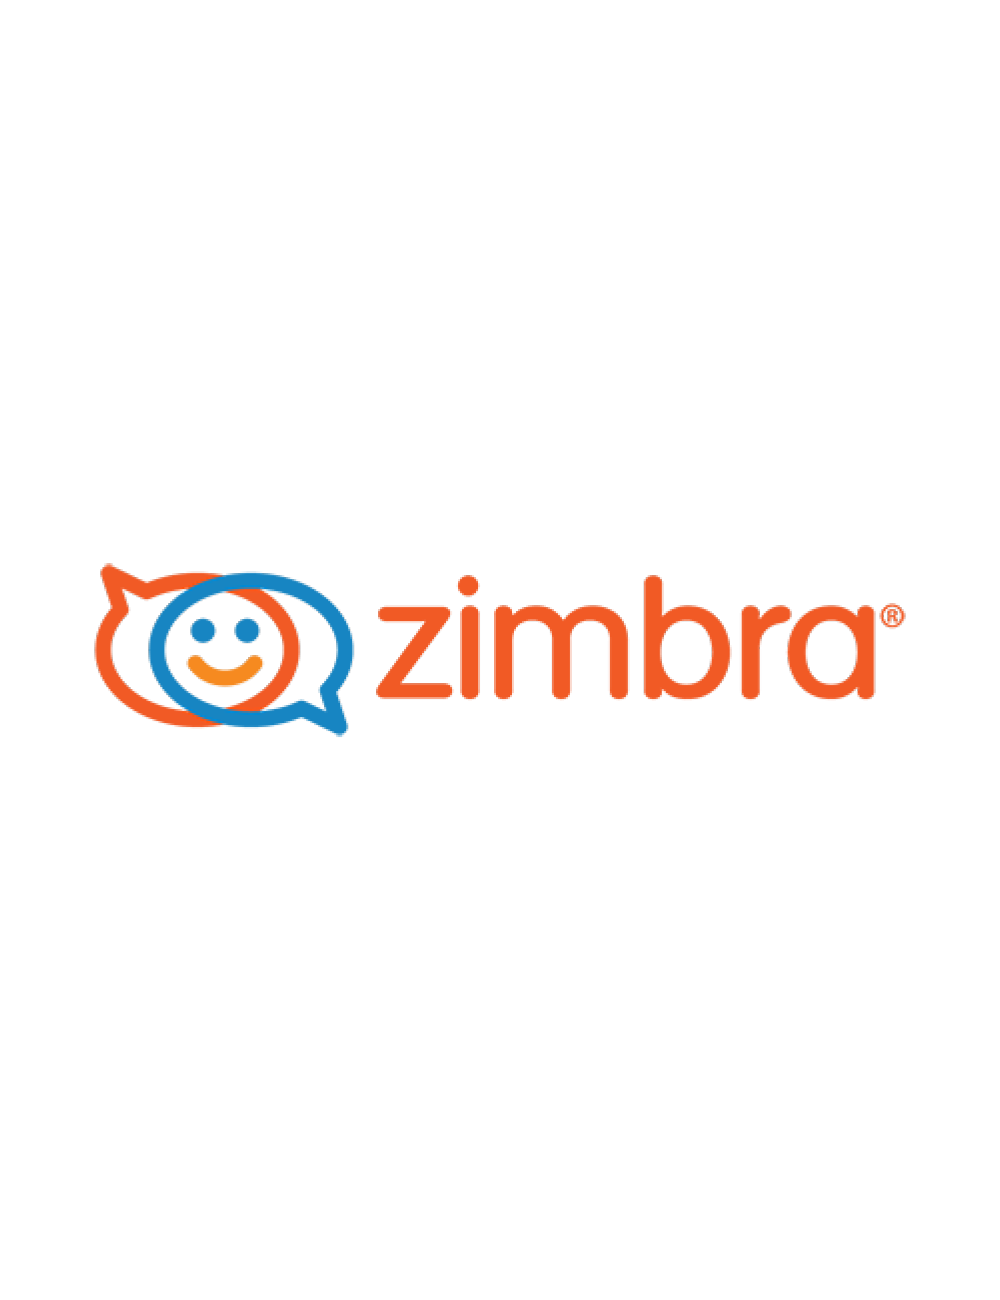 Pack 10 BAL Zimbra Basic + Domaine .FR - 1 an